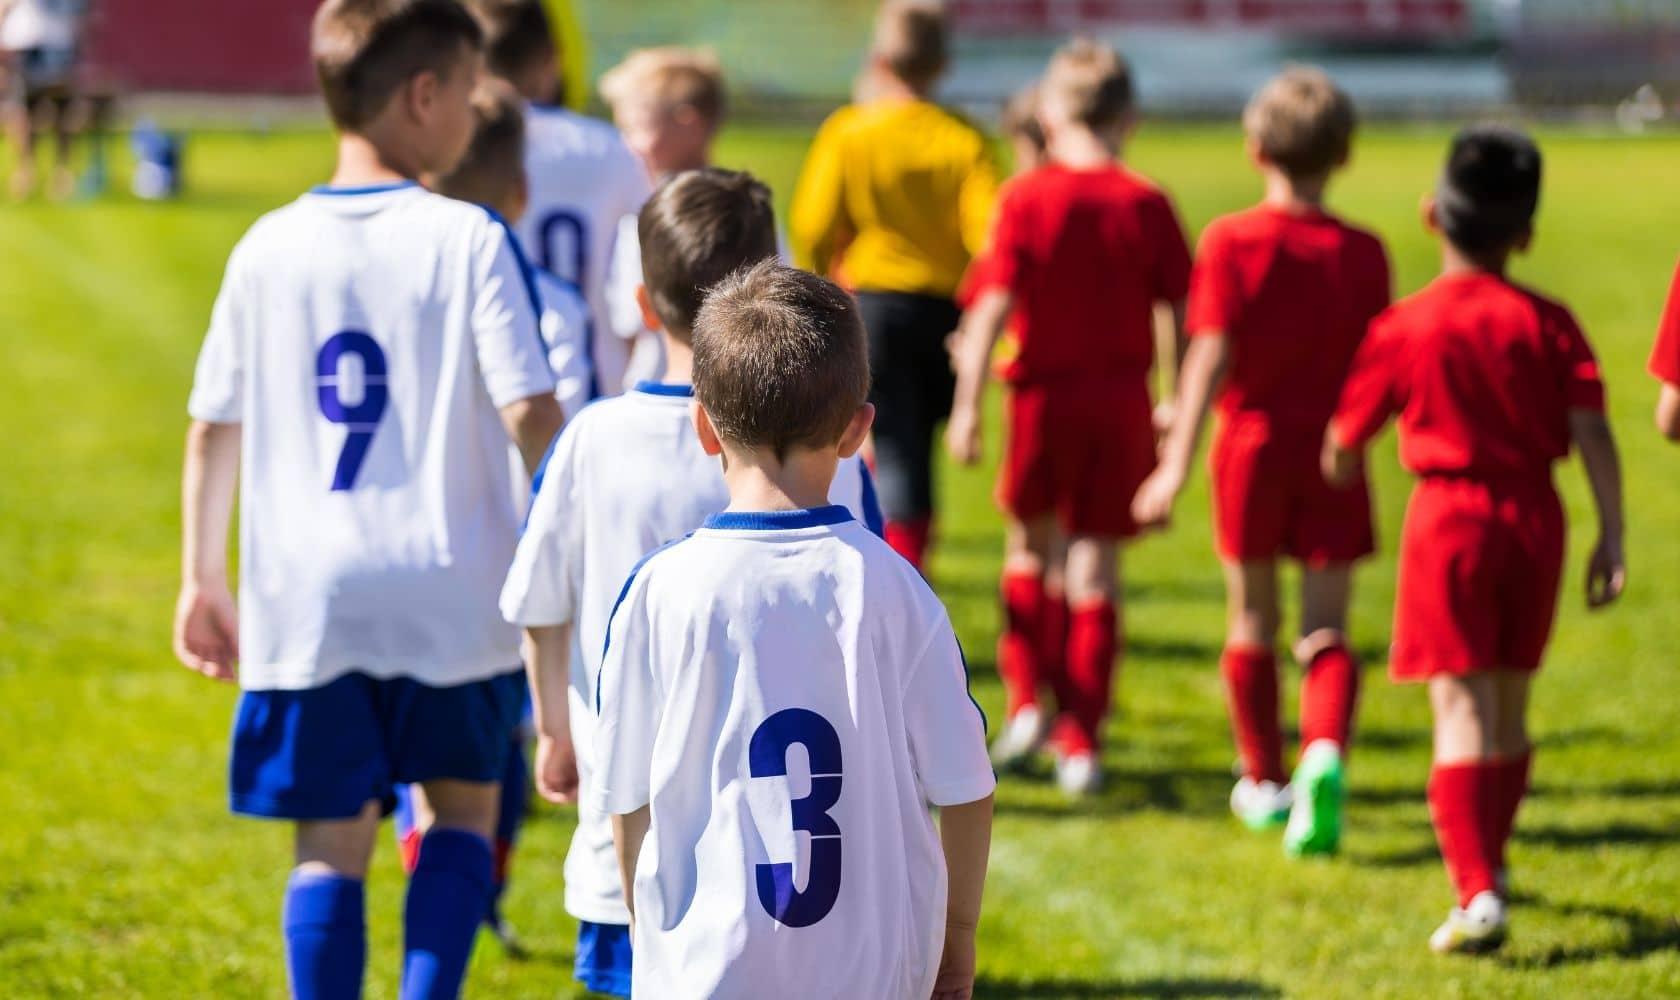 How to coach U8 soccer: A definitive guide to coaching U8 soccer drills.